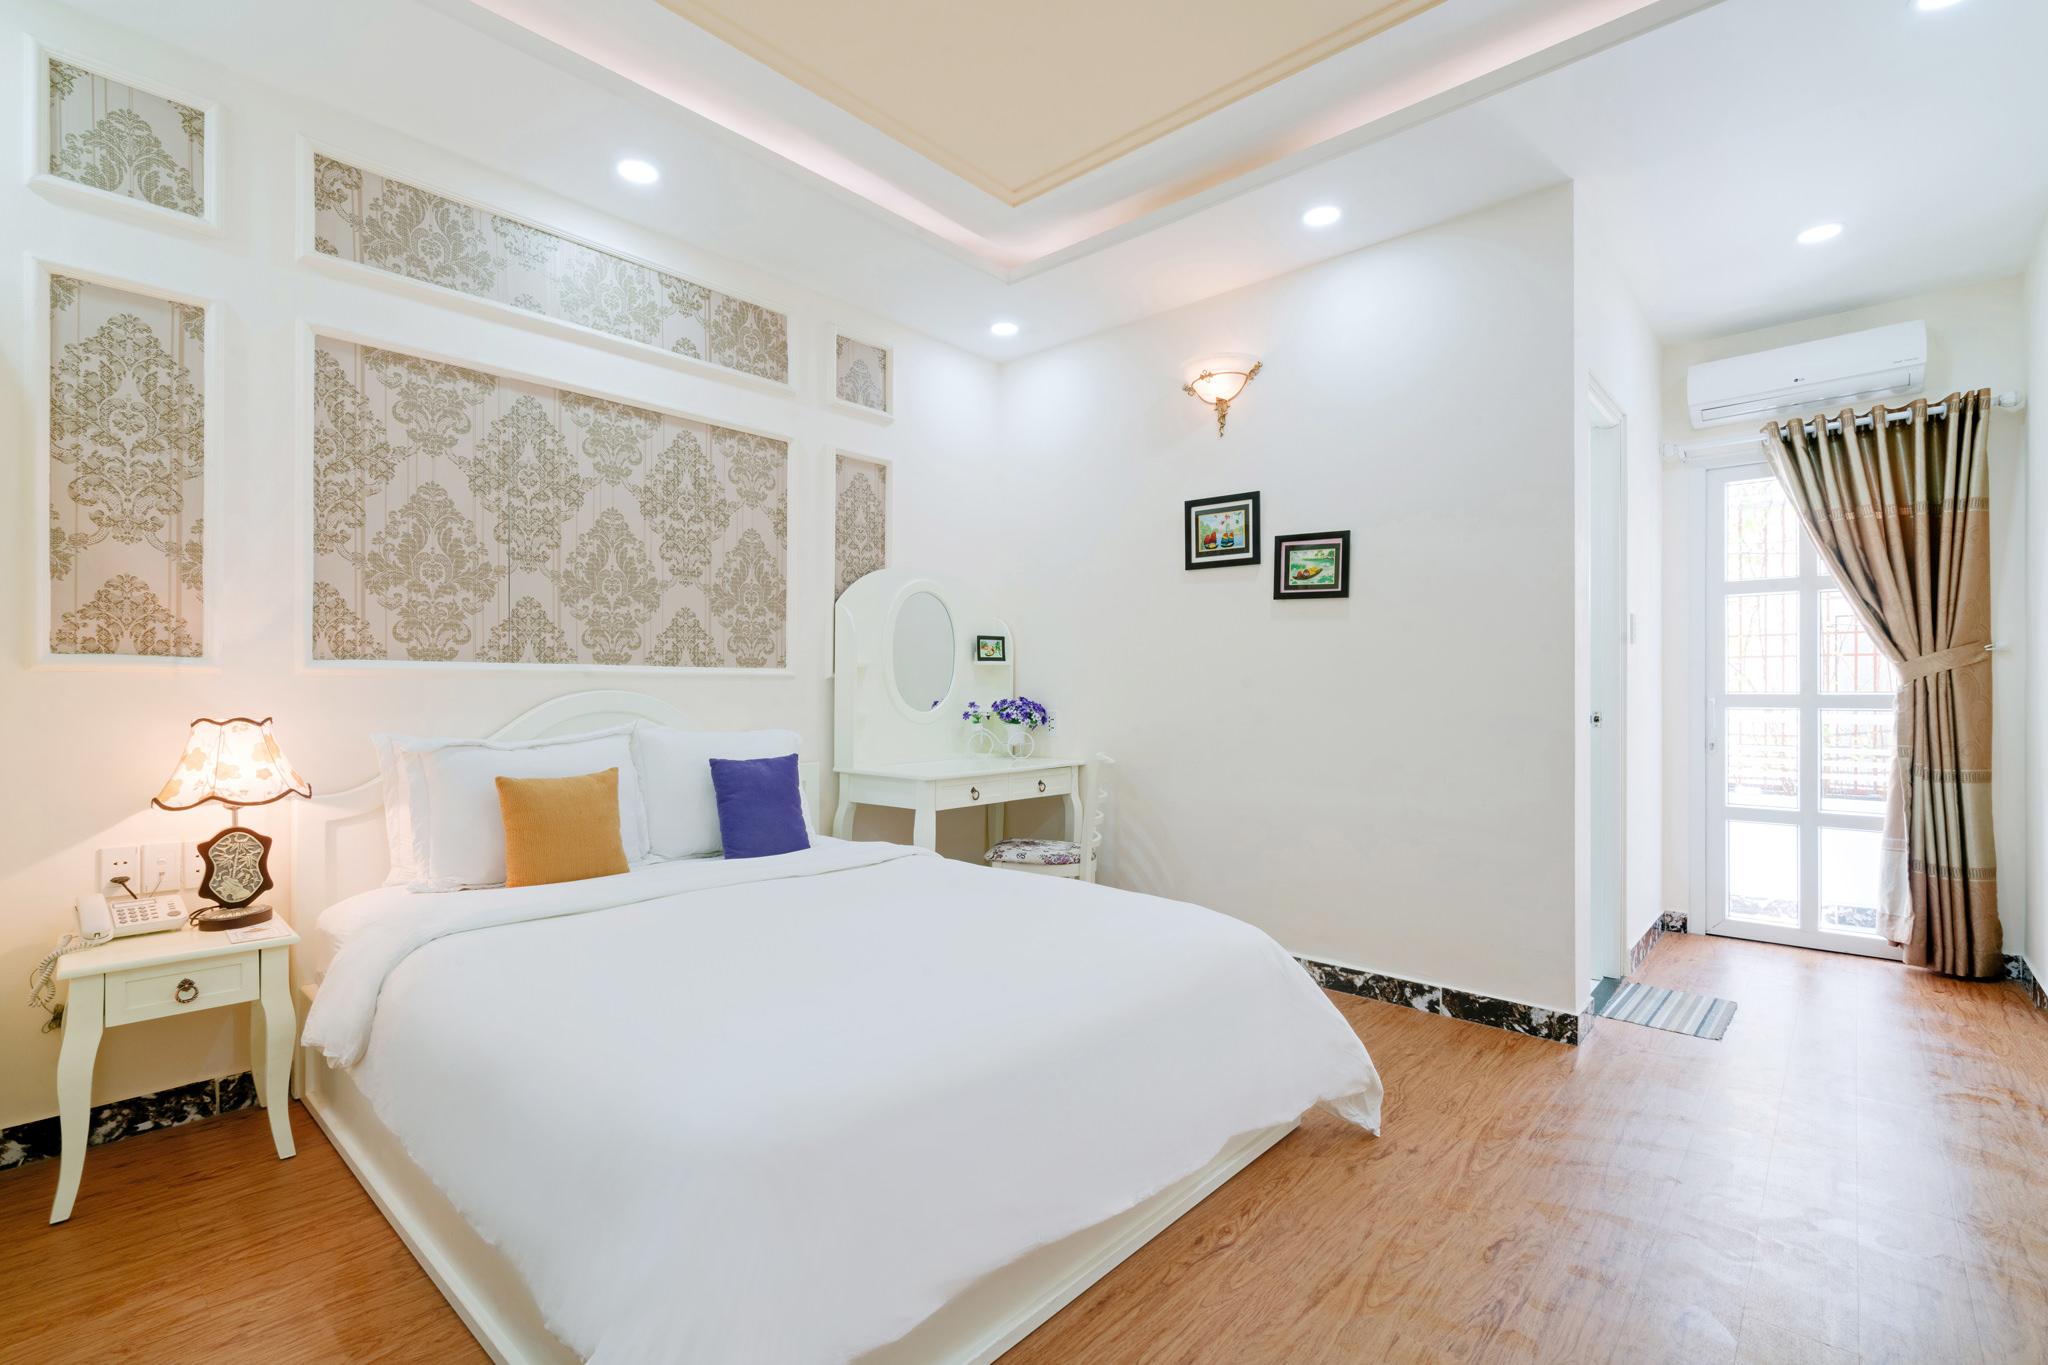 20180529 - Chez Mimosa - Interior - Hotel - 029.jpg